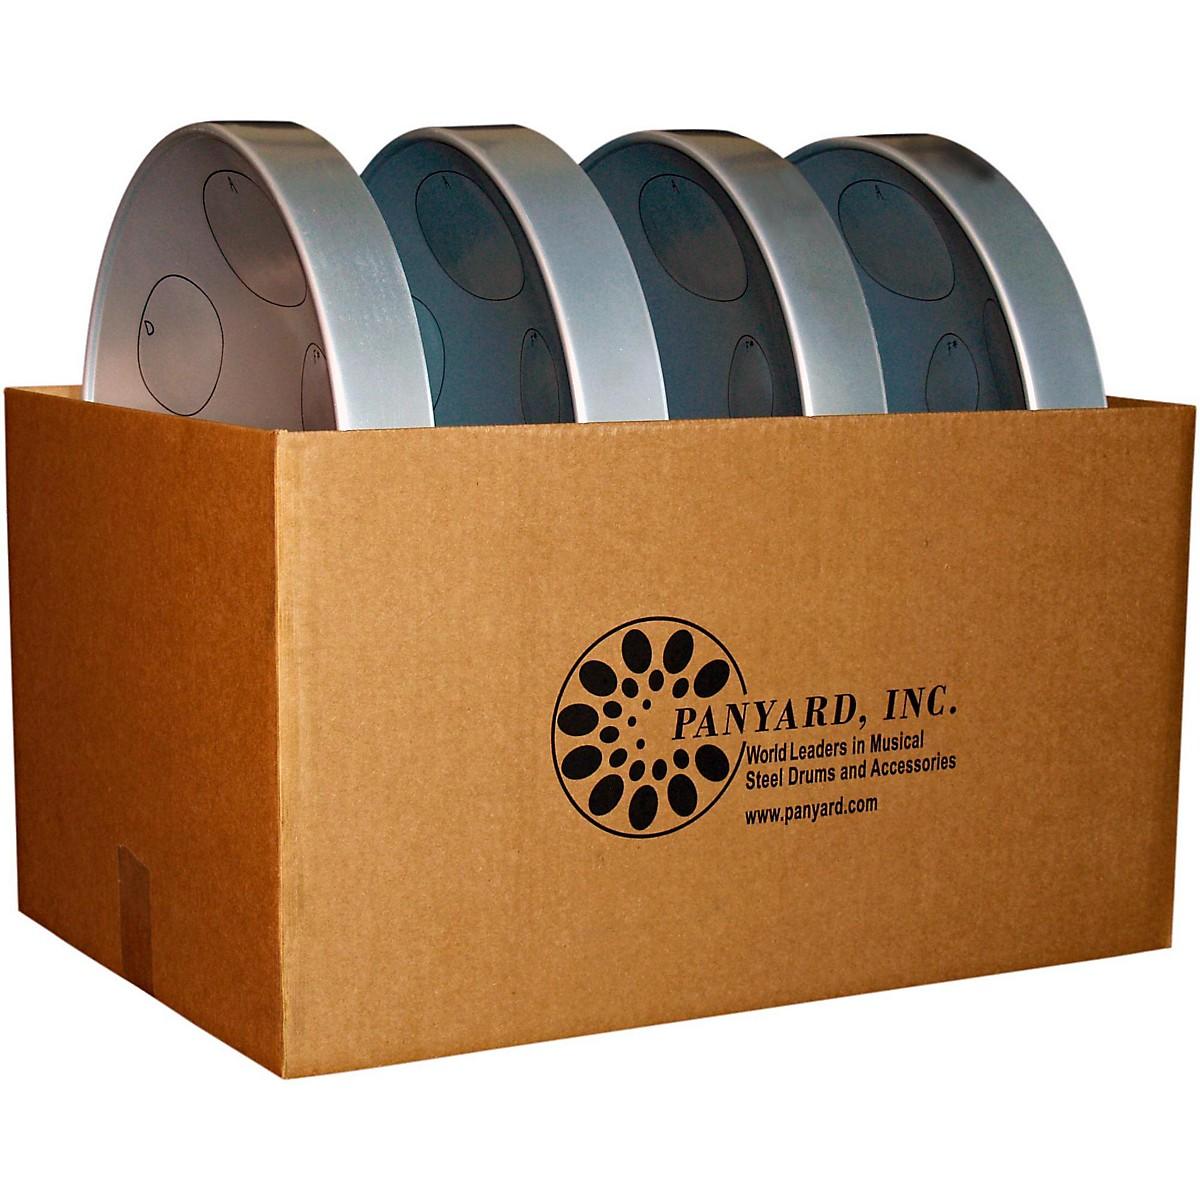 Panyard Jumbie Jam Educator's Steel Drum 4-Pack with Table Top Stands